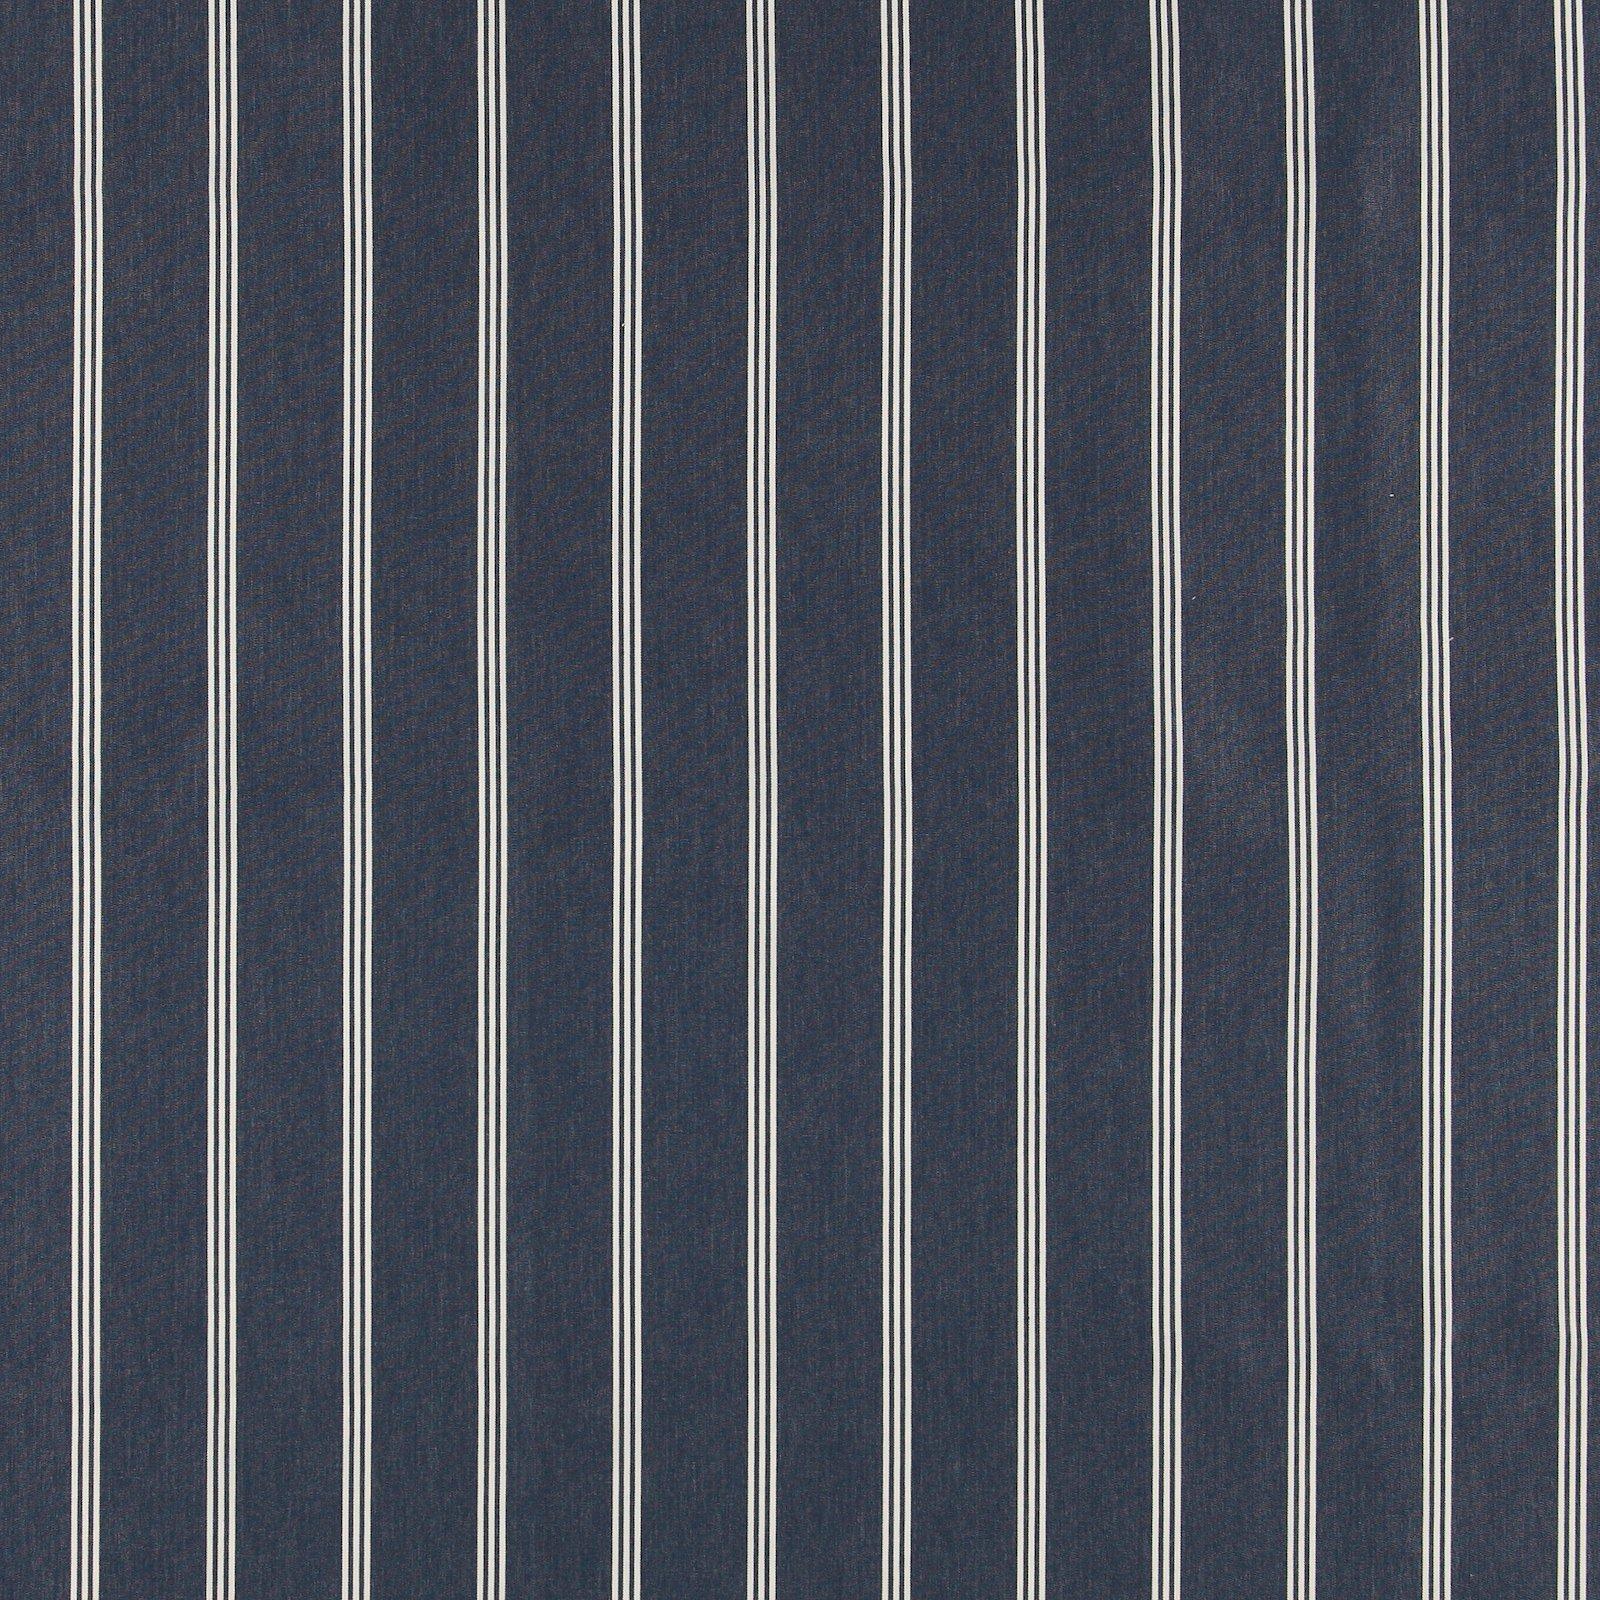 Dralon navy w white stripe Teflon coated 823707_pack_sp